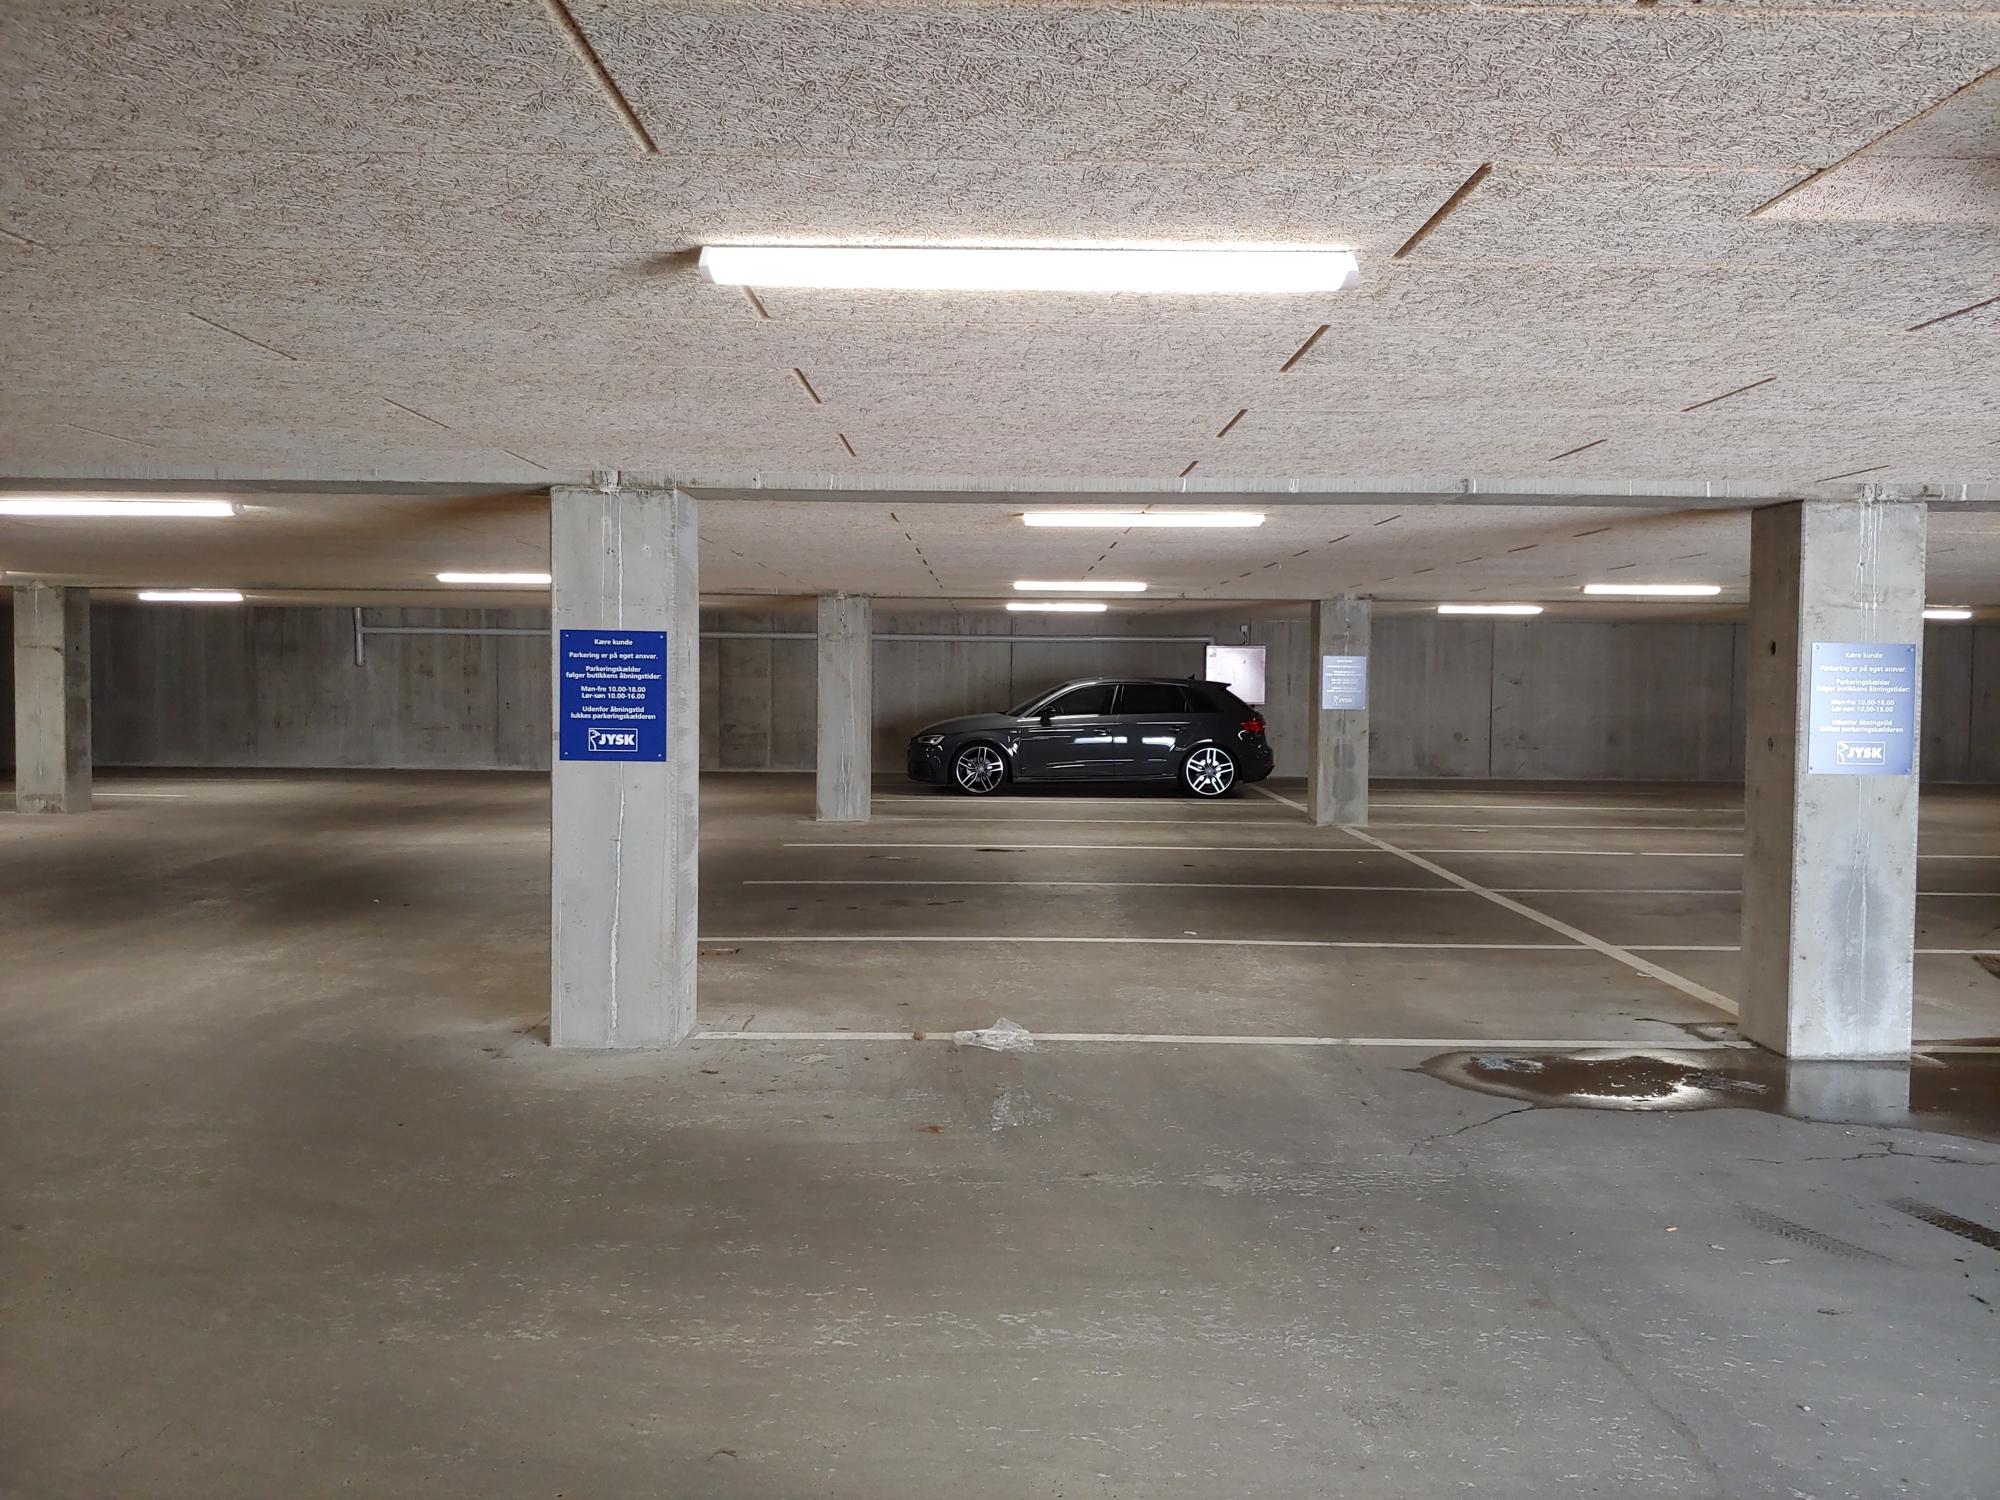 Extreme parking 1.jpg